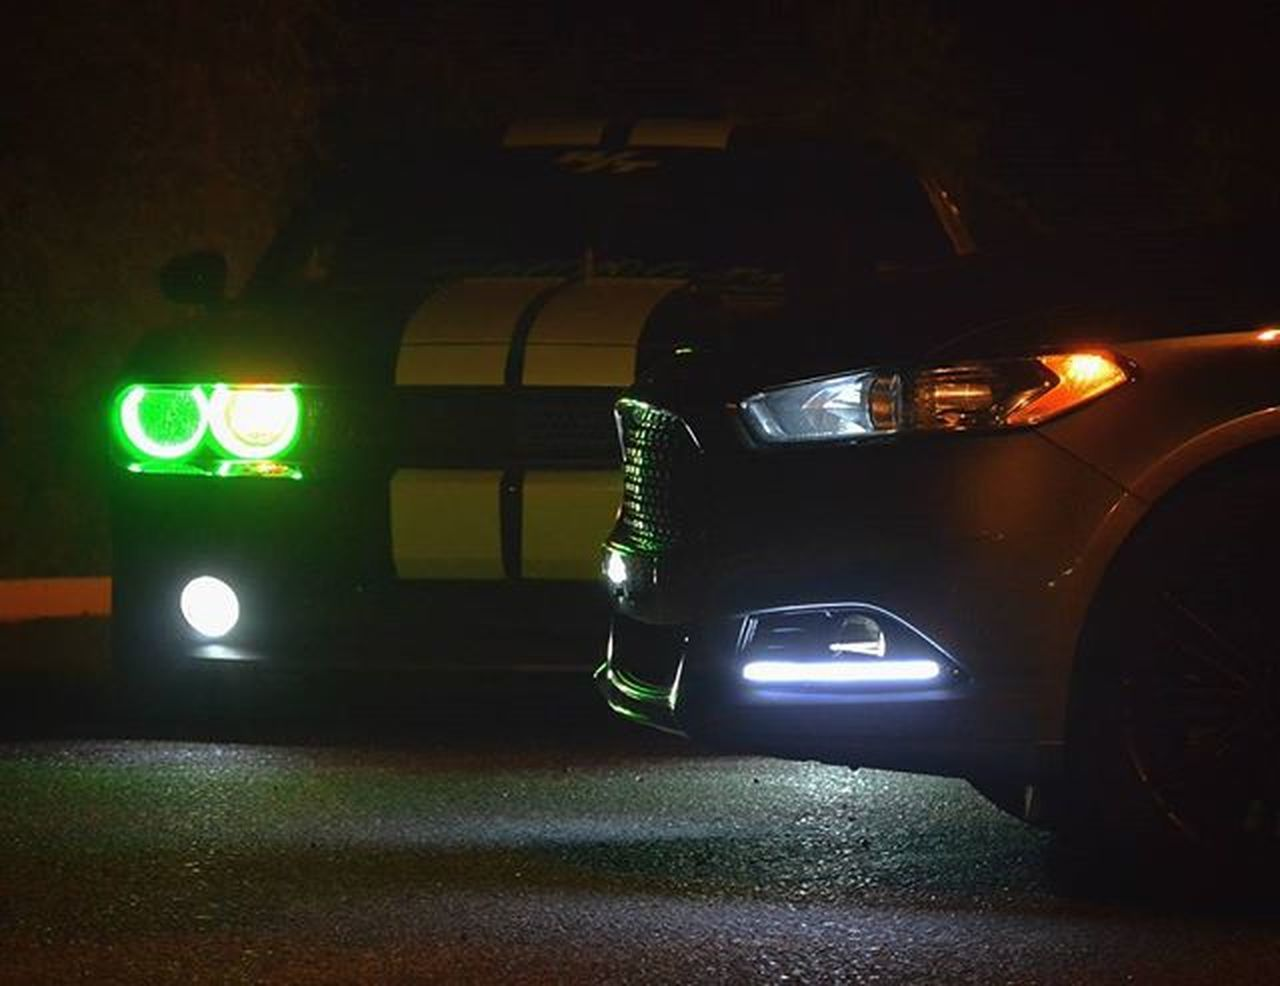 car, night, illuminated, headlight, transportation, no people, land vehicle, indoors